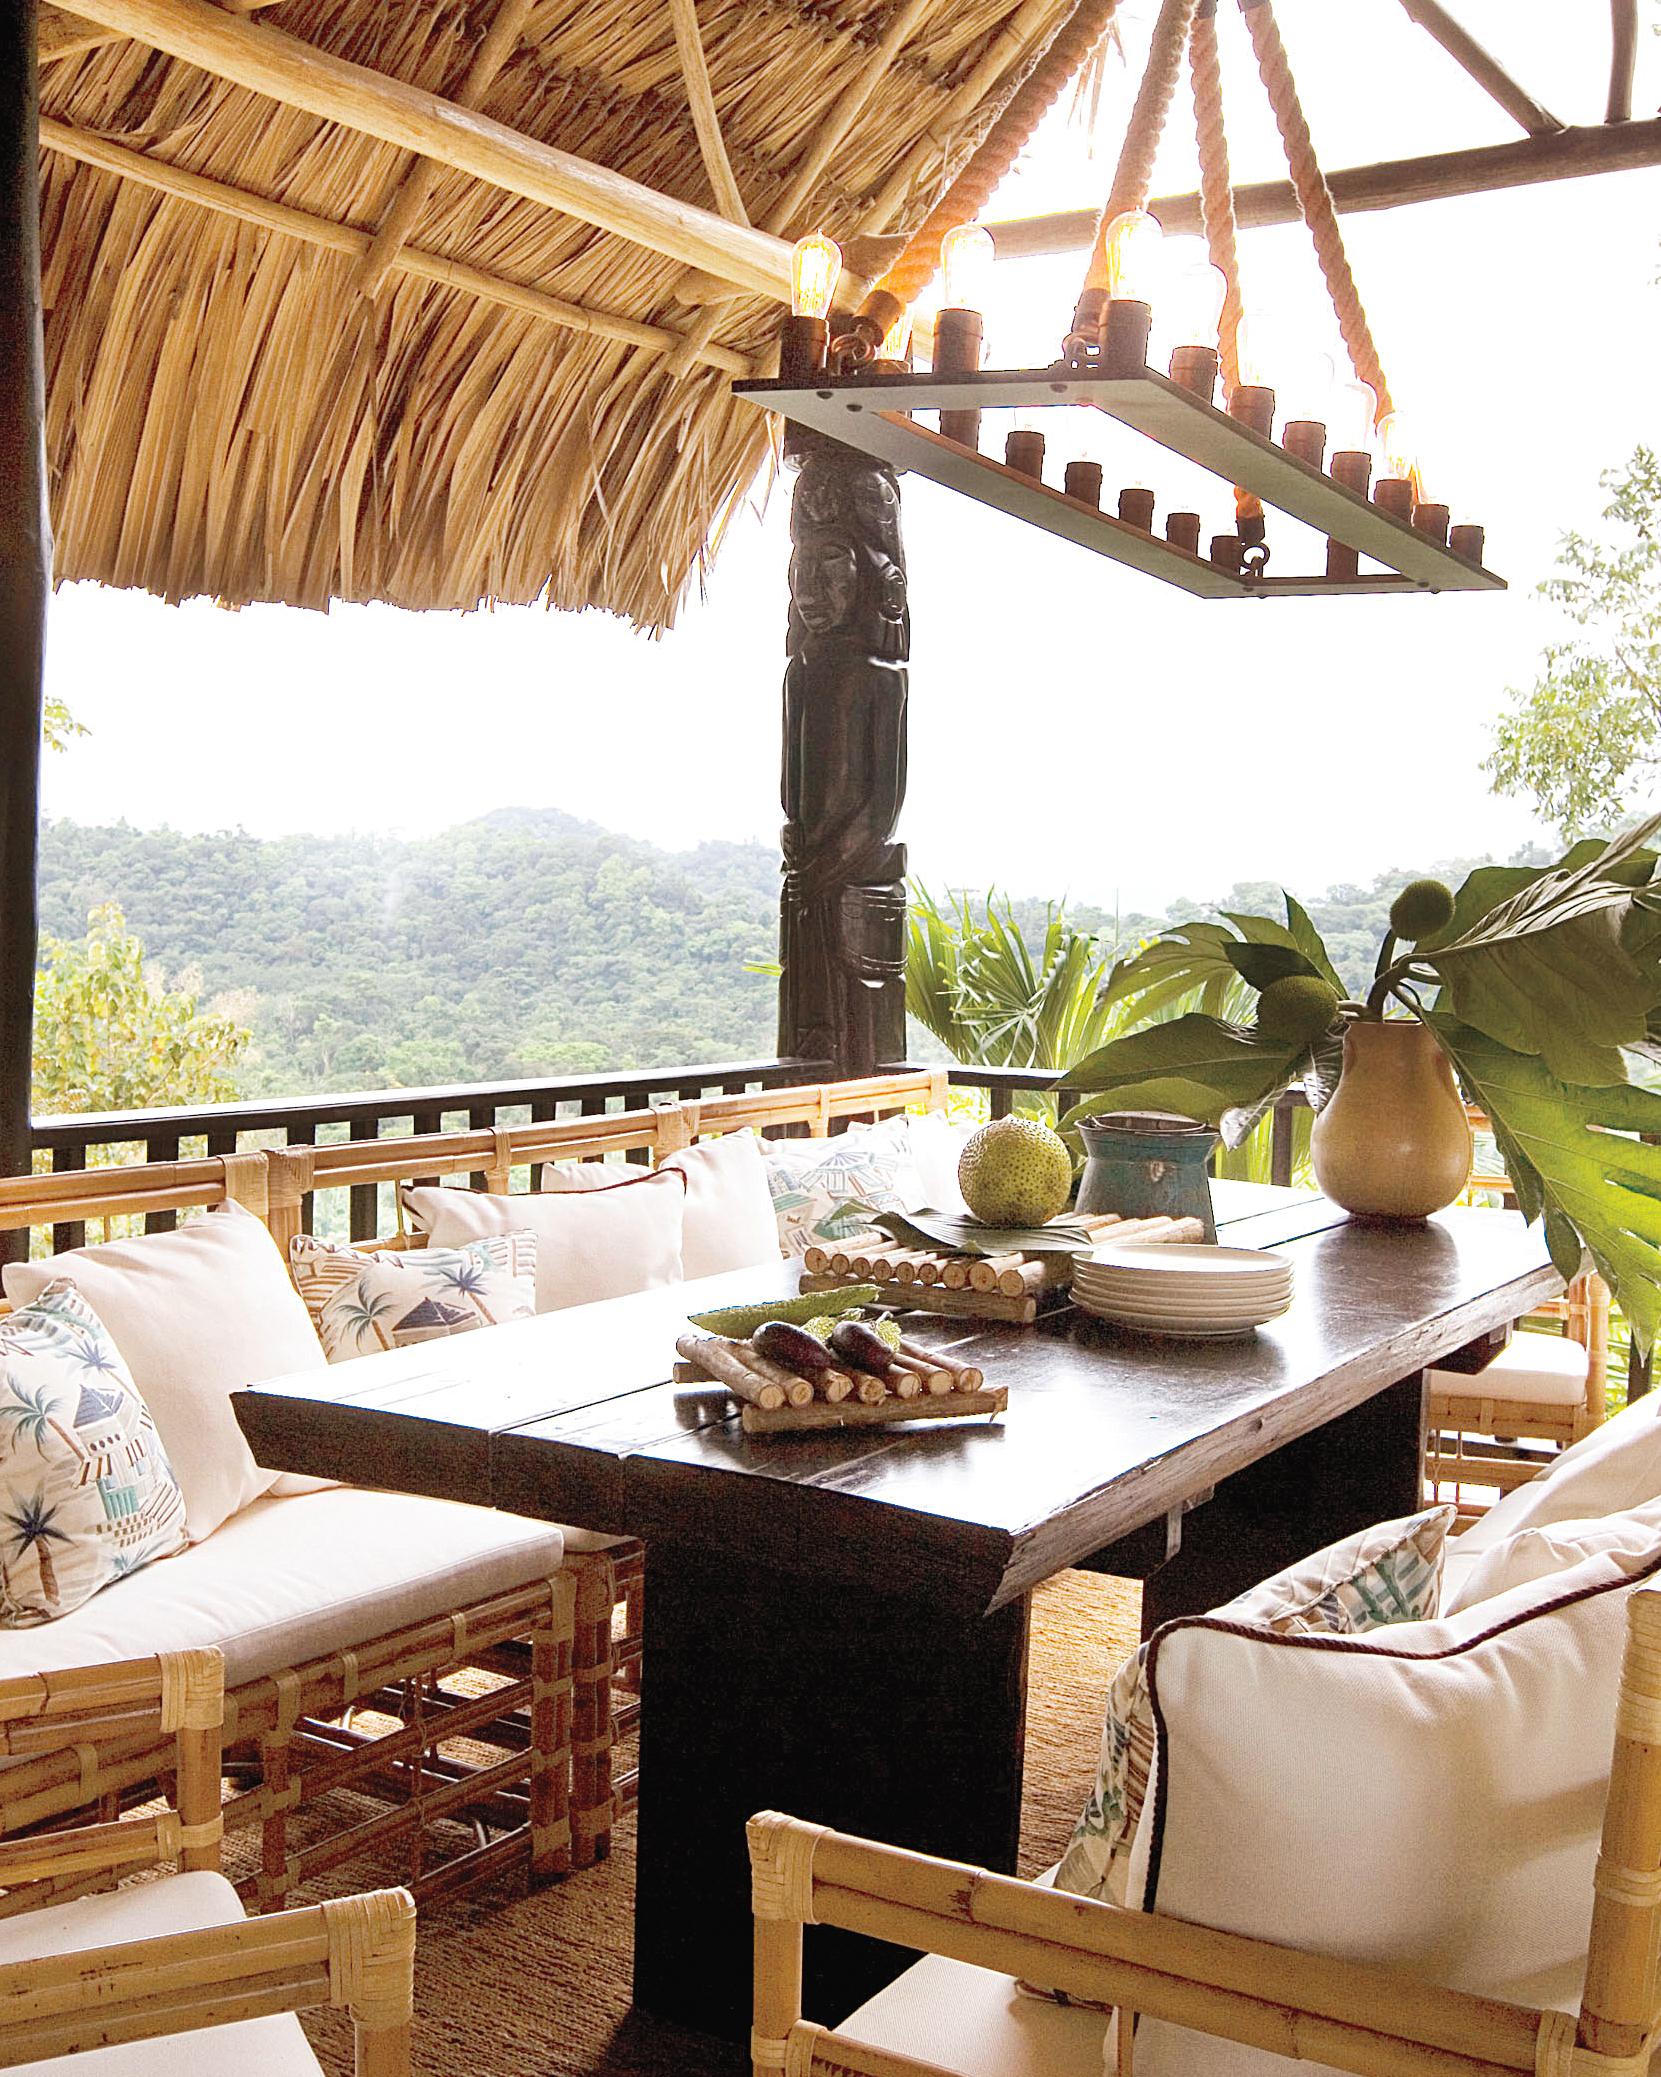 jungle-dining-photo-6-s111603.jpg